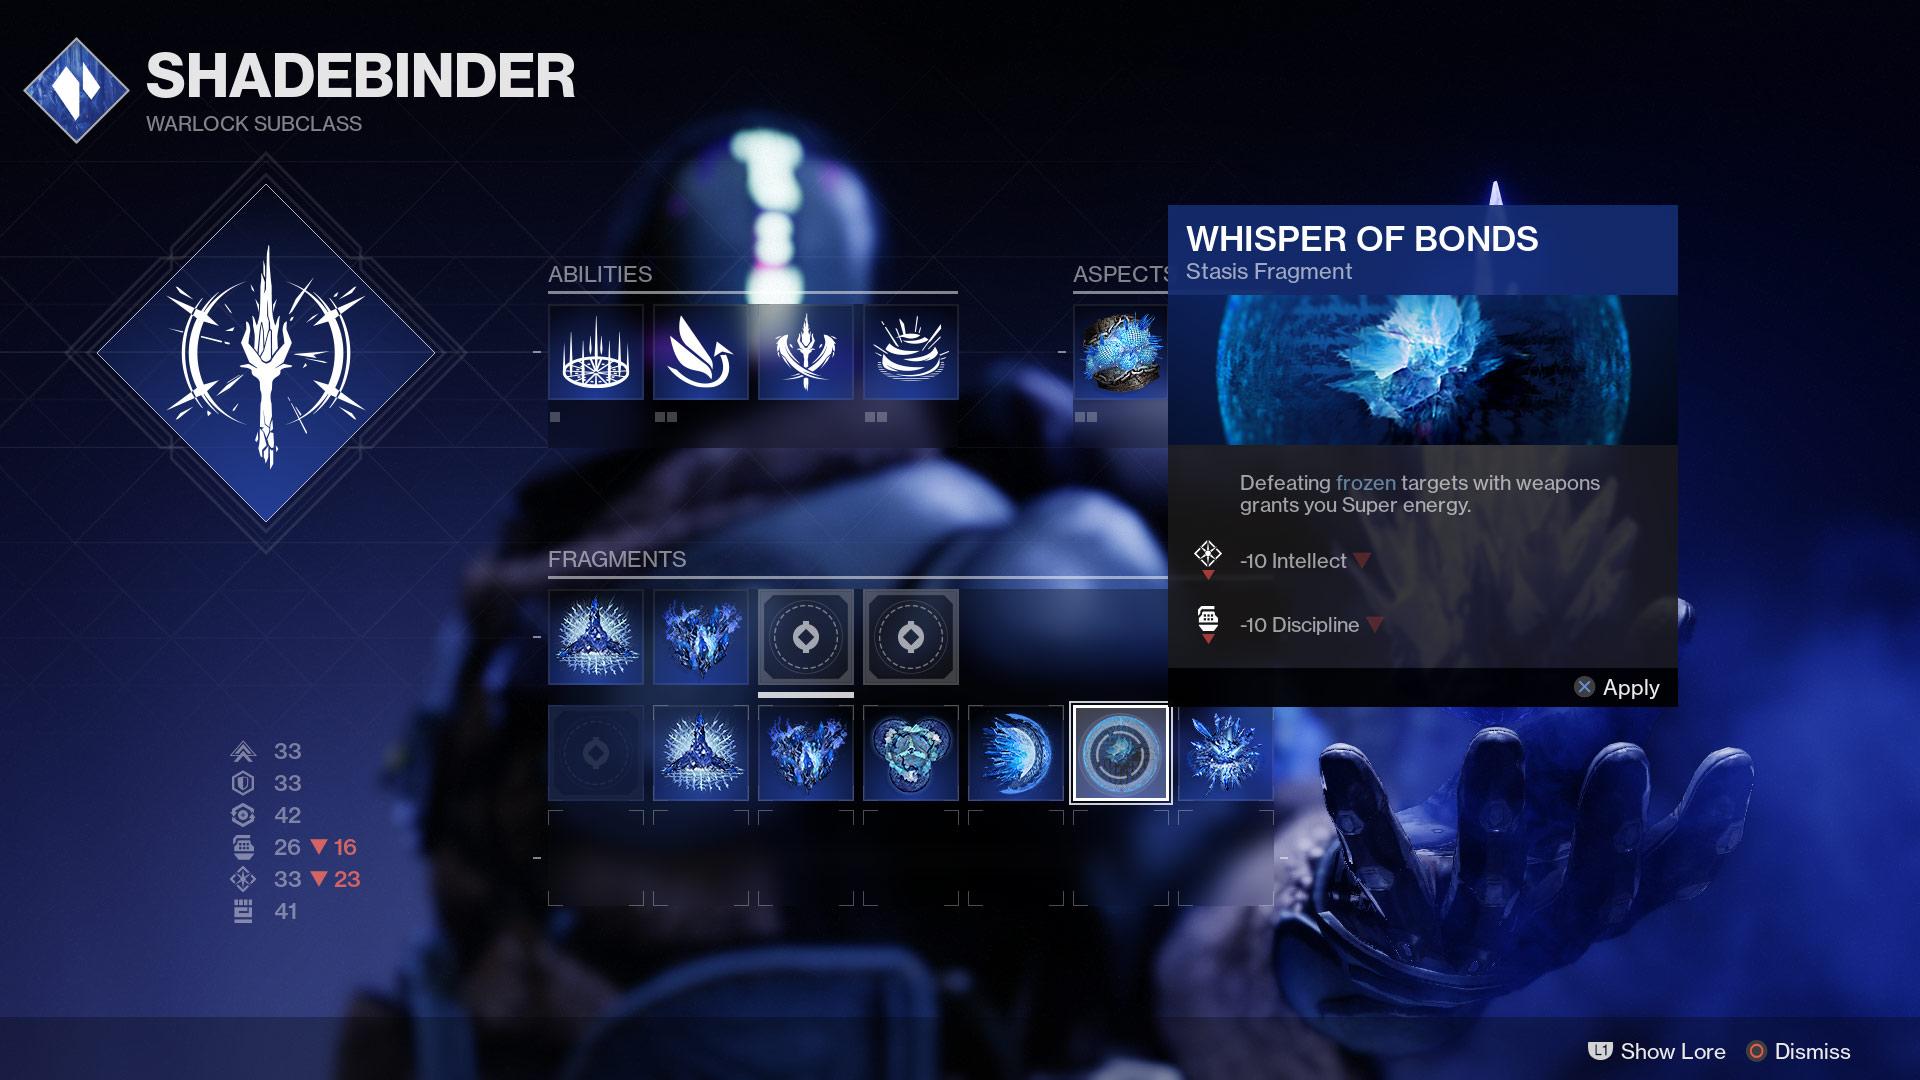 Warlock Stasis Subclass fragments EN - Stasis Spotlight: Warlock Shadebinder